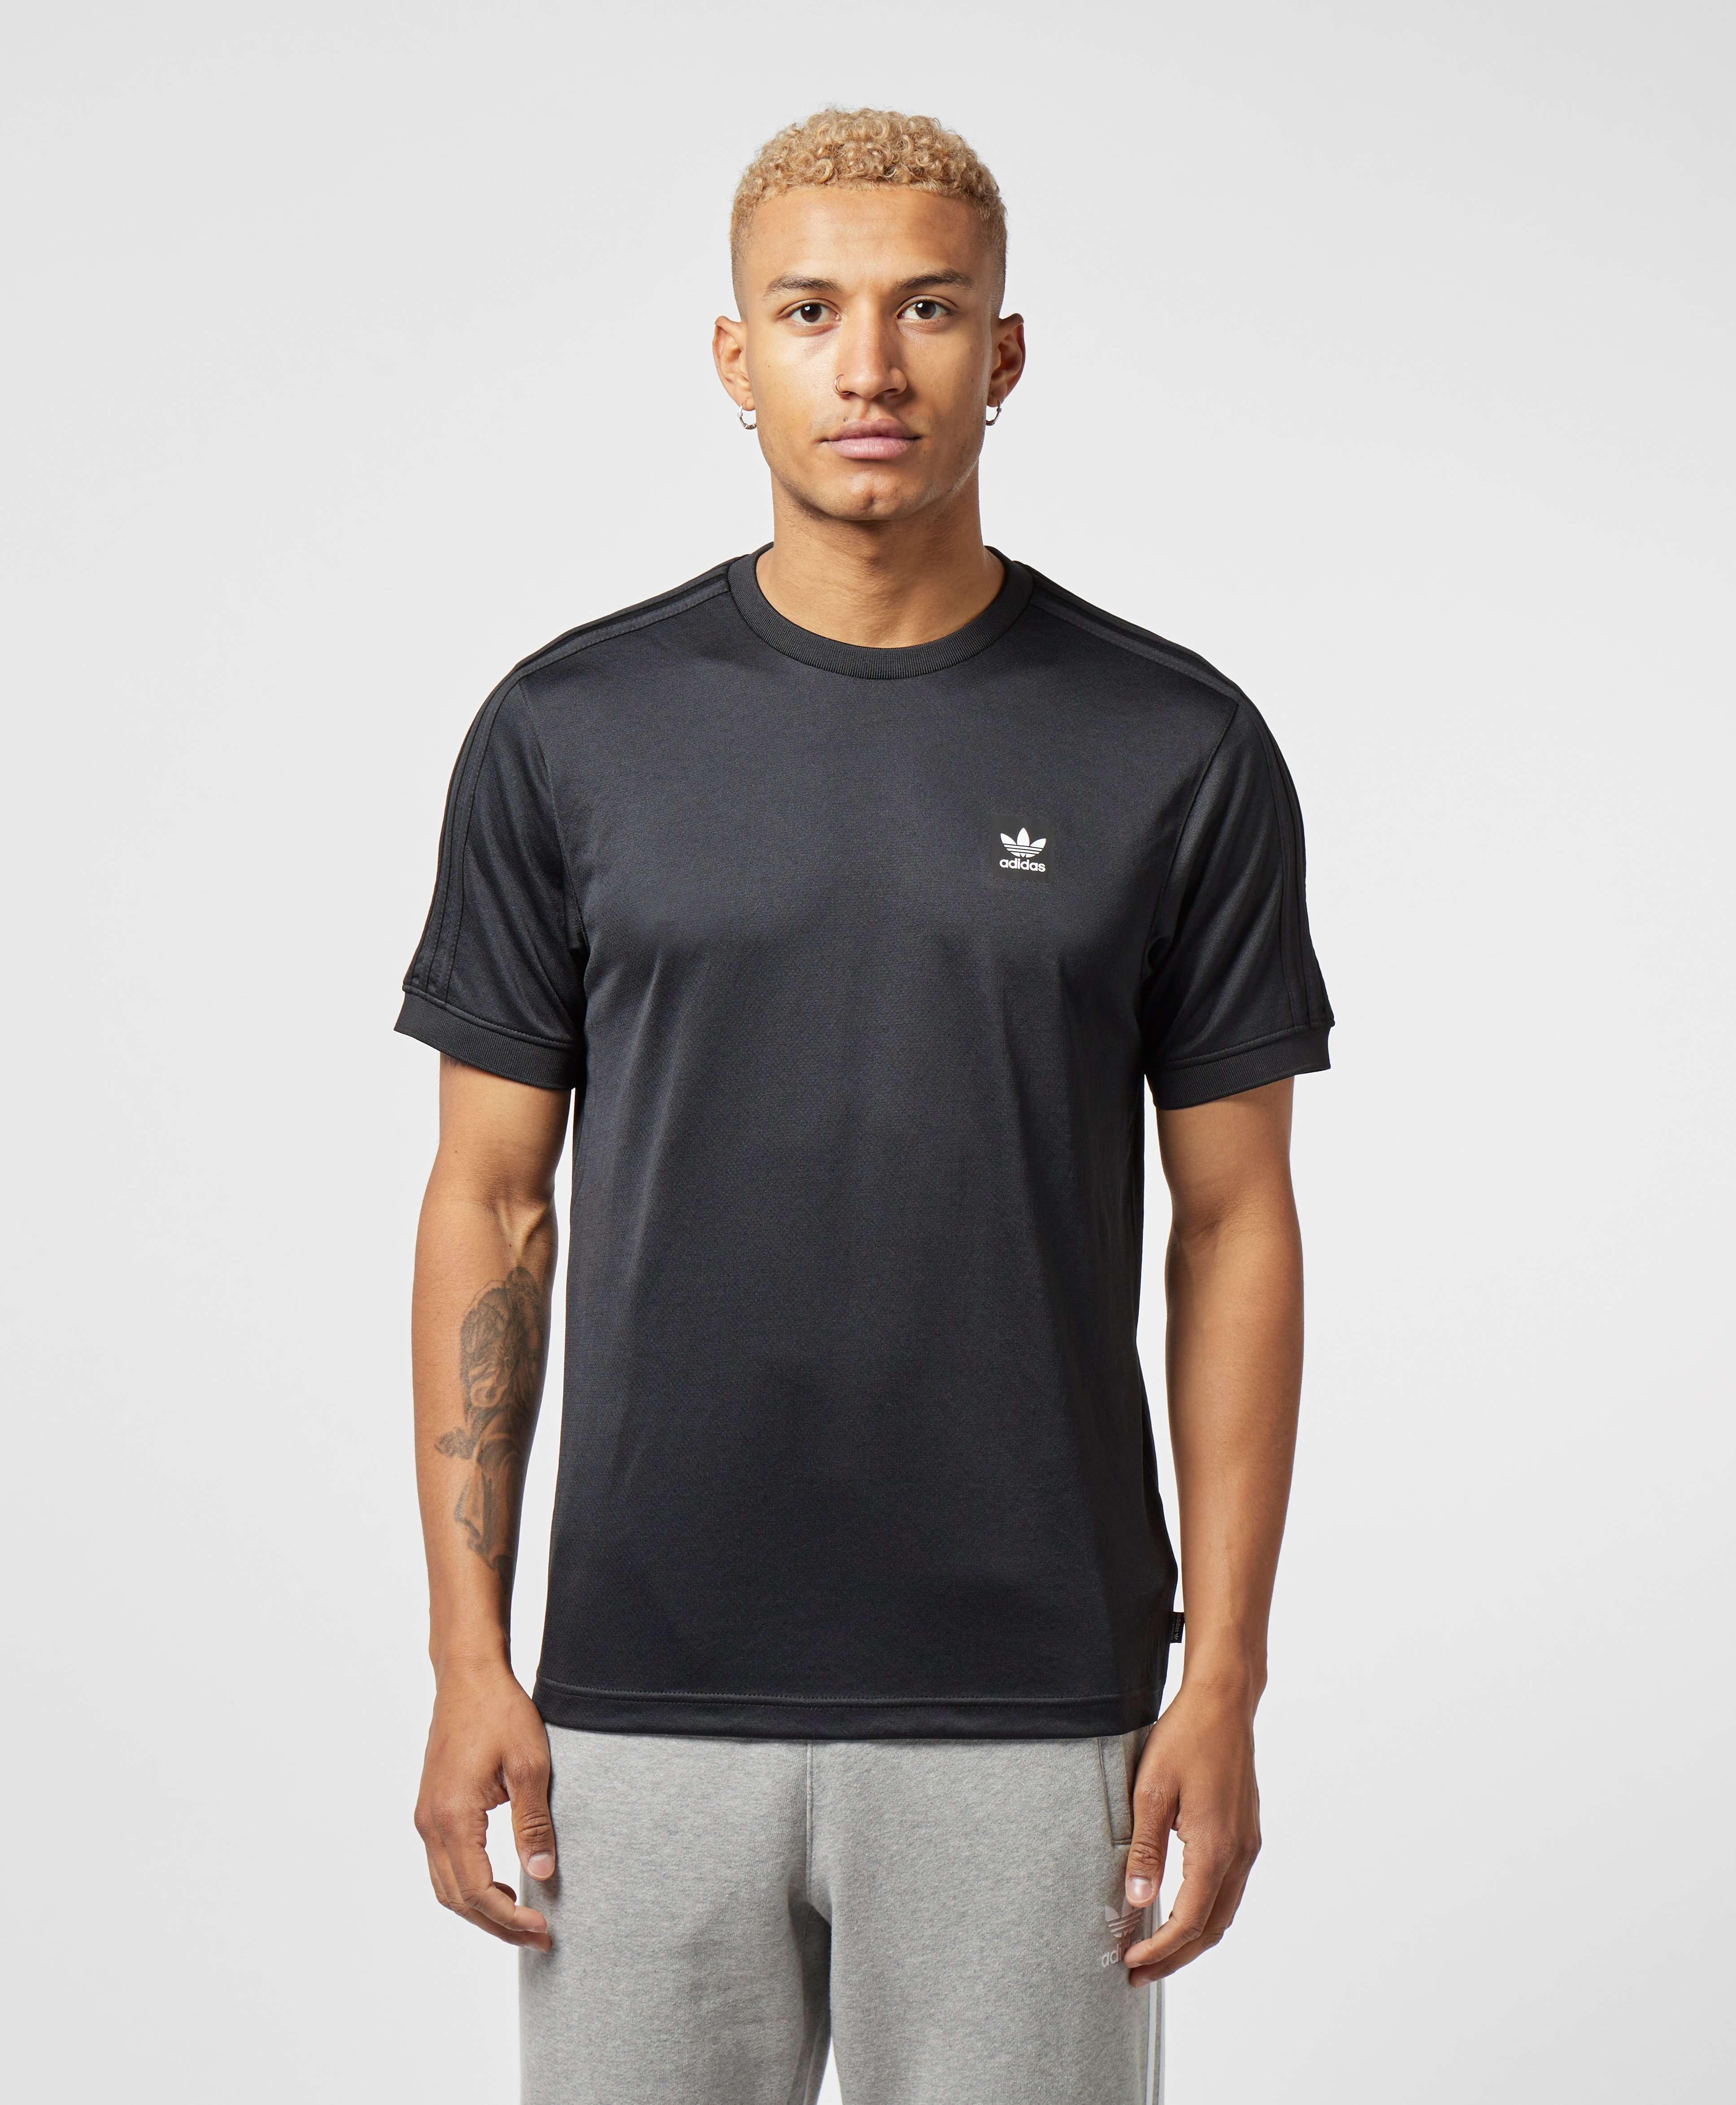 adidas Originals Club Jersey Short Sleeve T-Shirt